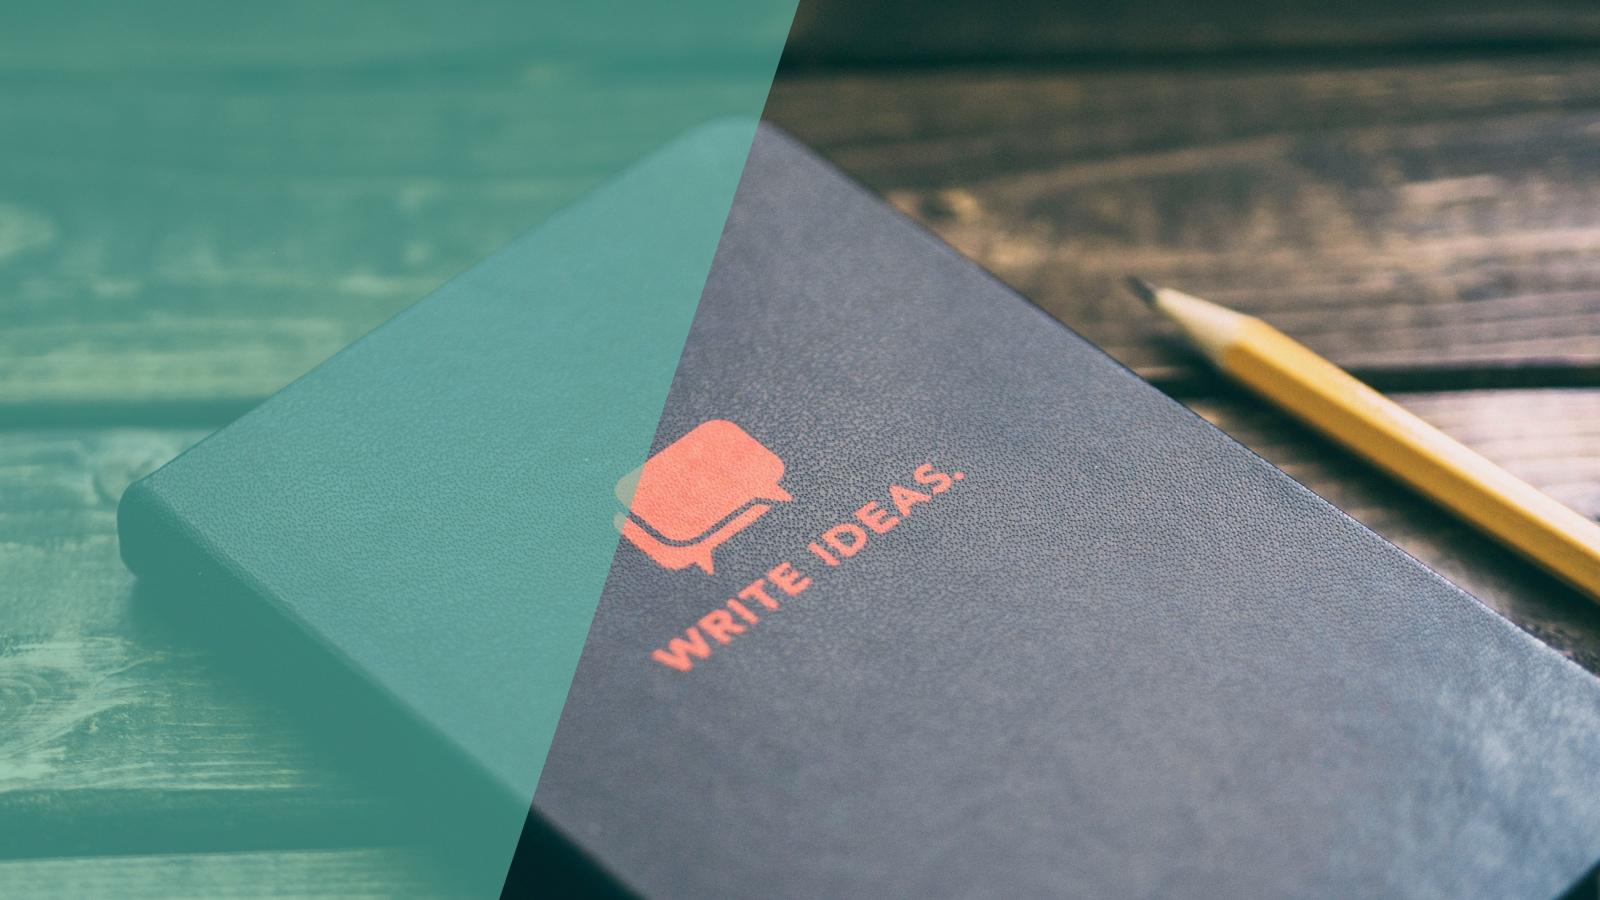 Webflow for creative & digital agencies: Advantages for clients